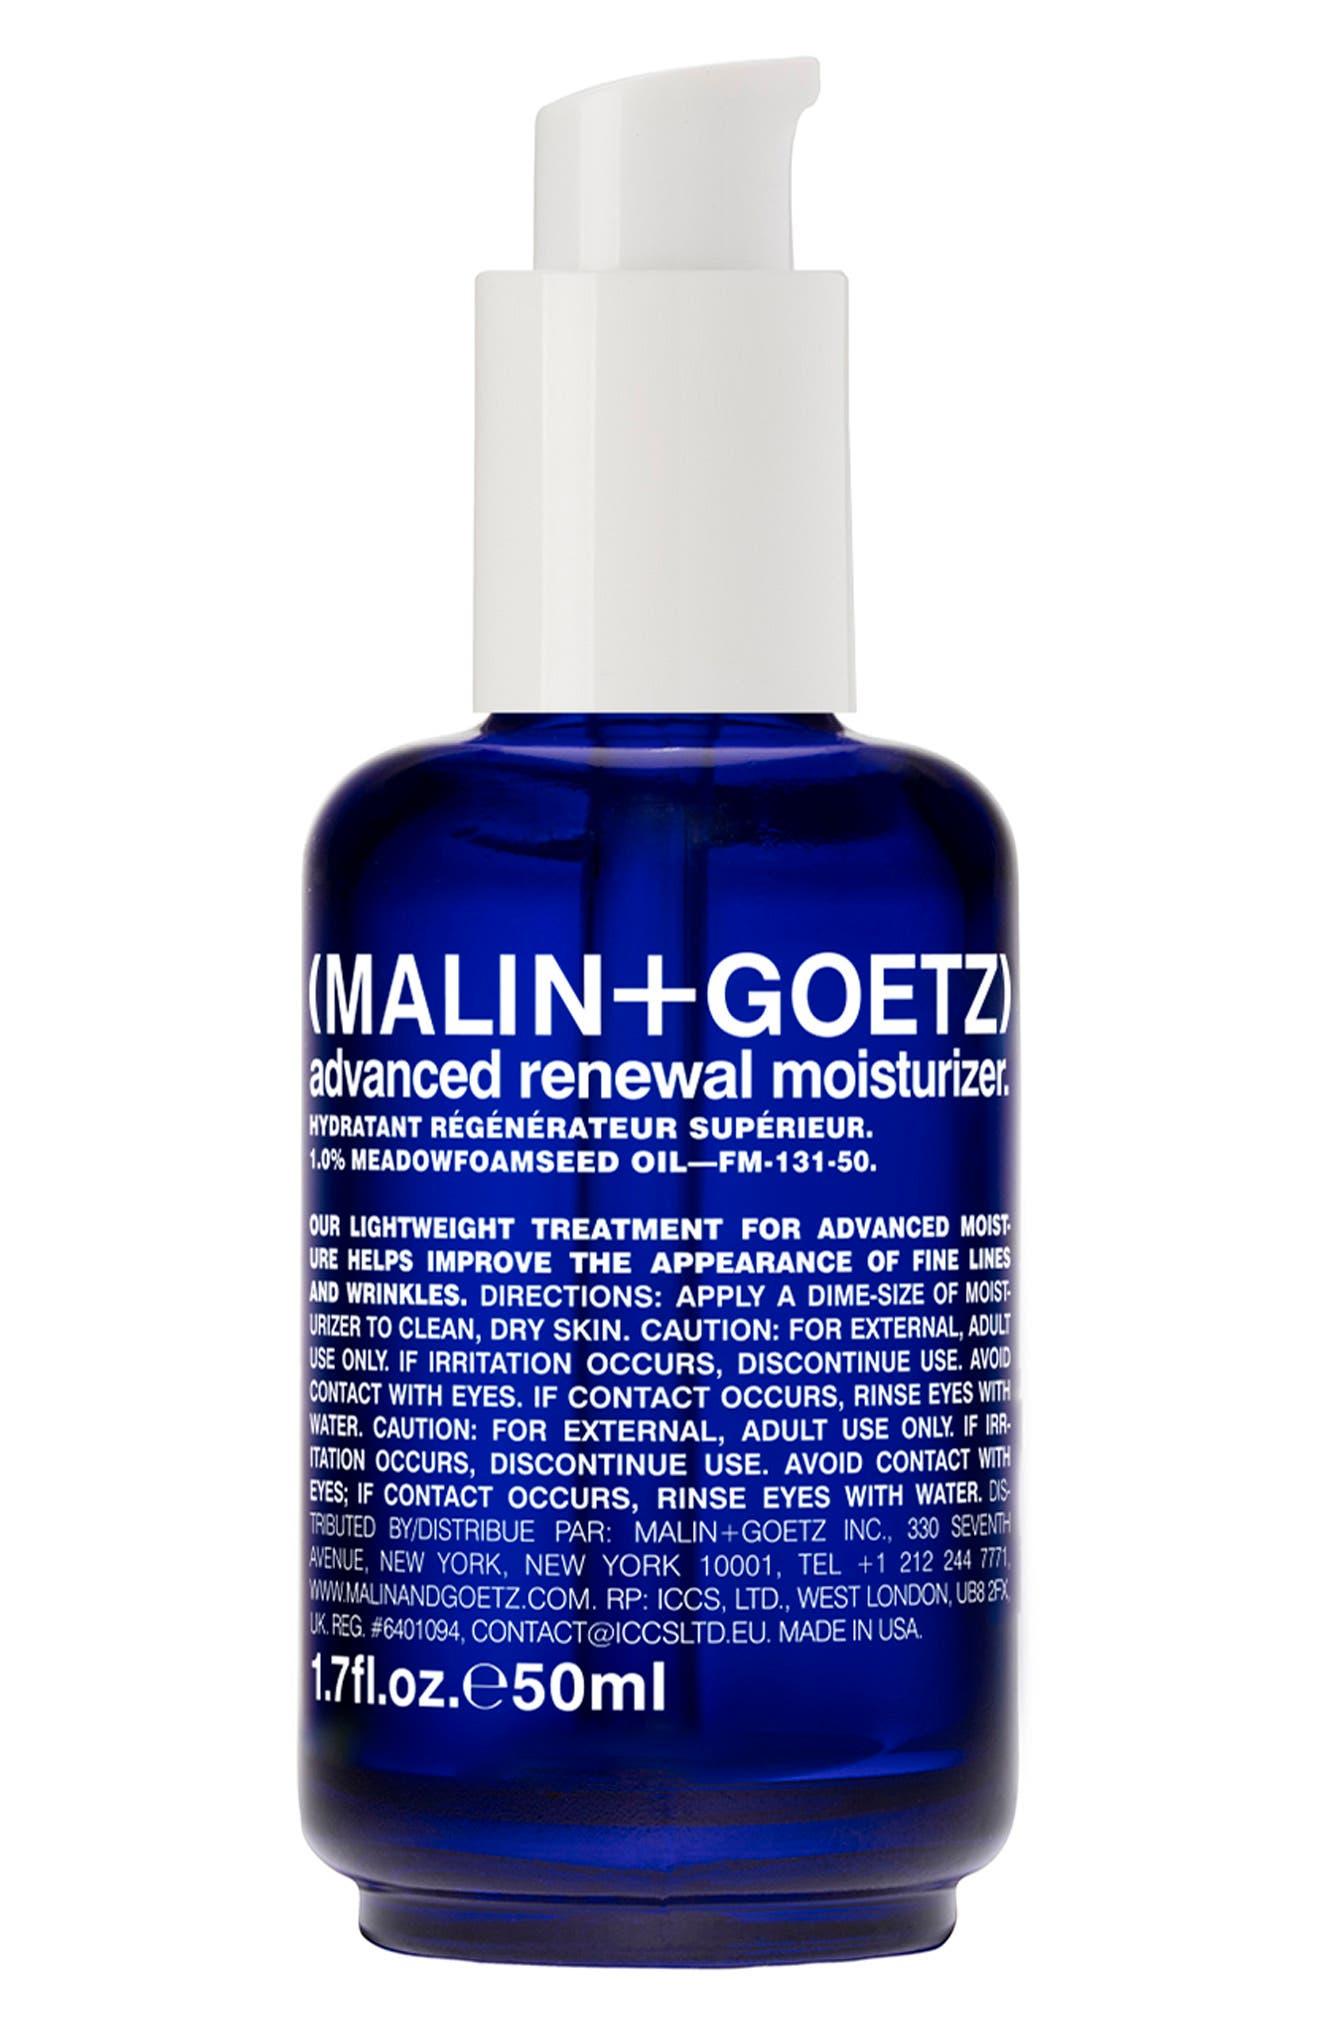 Malin+Goetz Advanced Renewal Moisturizer